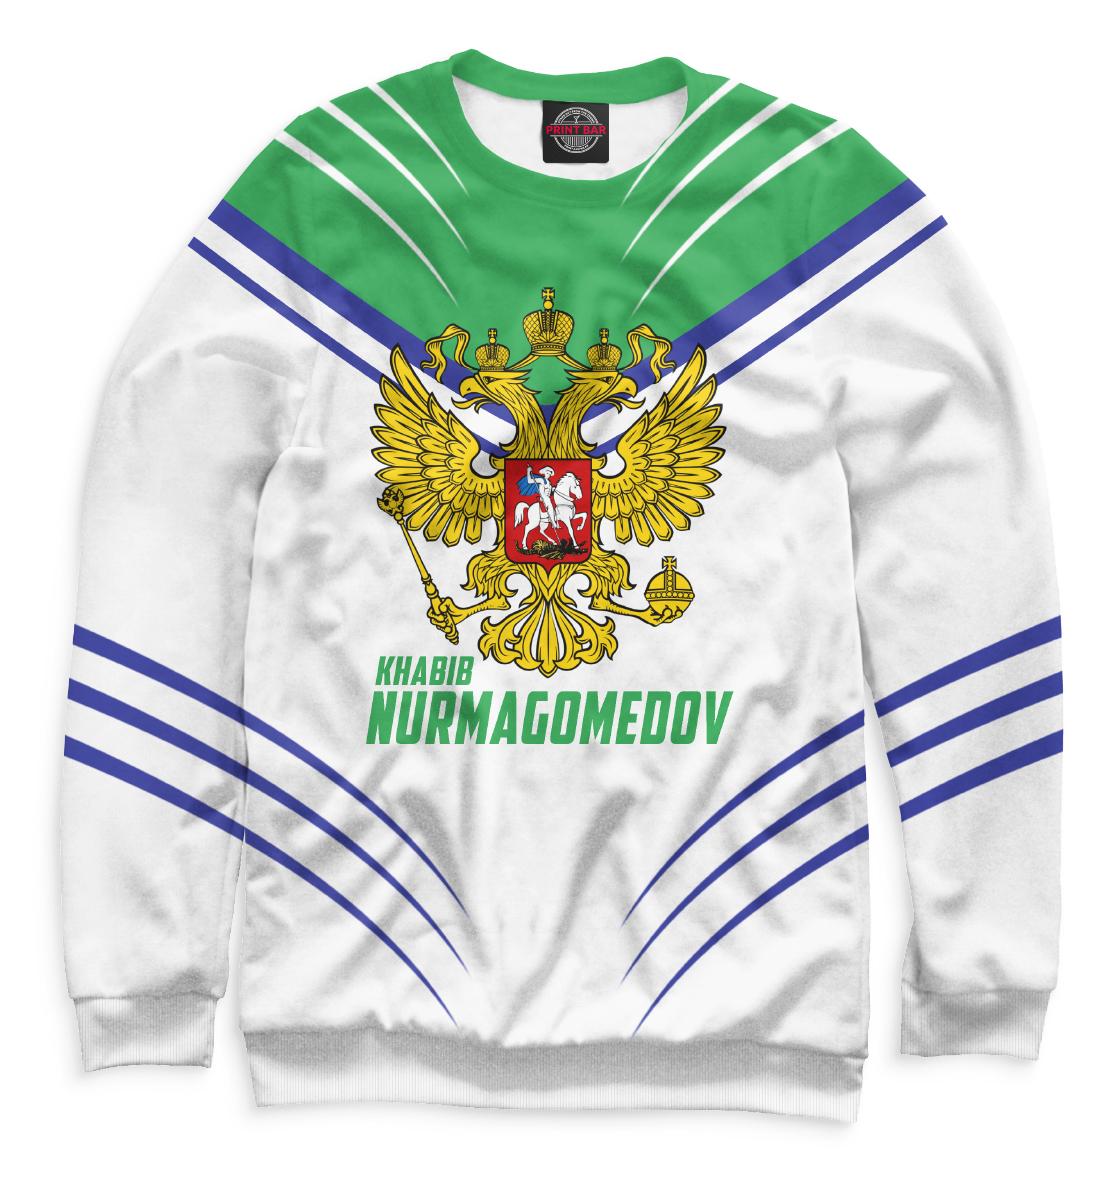 Купить Хабиб Нурмагомедов, Printbar, Свитшоты, MNU-884871-swi-1